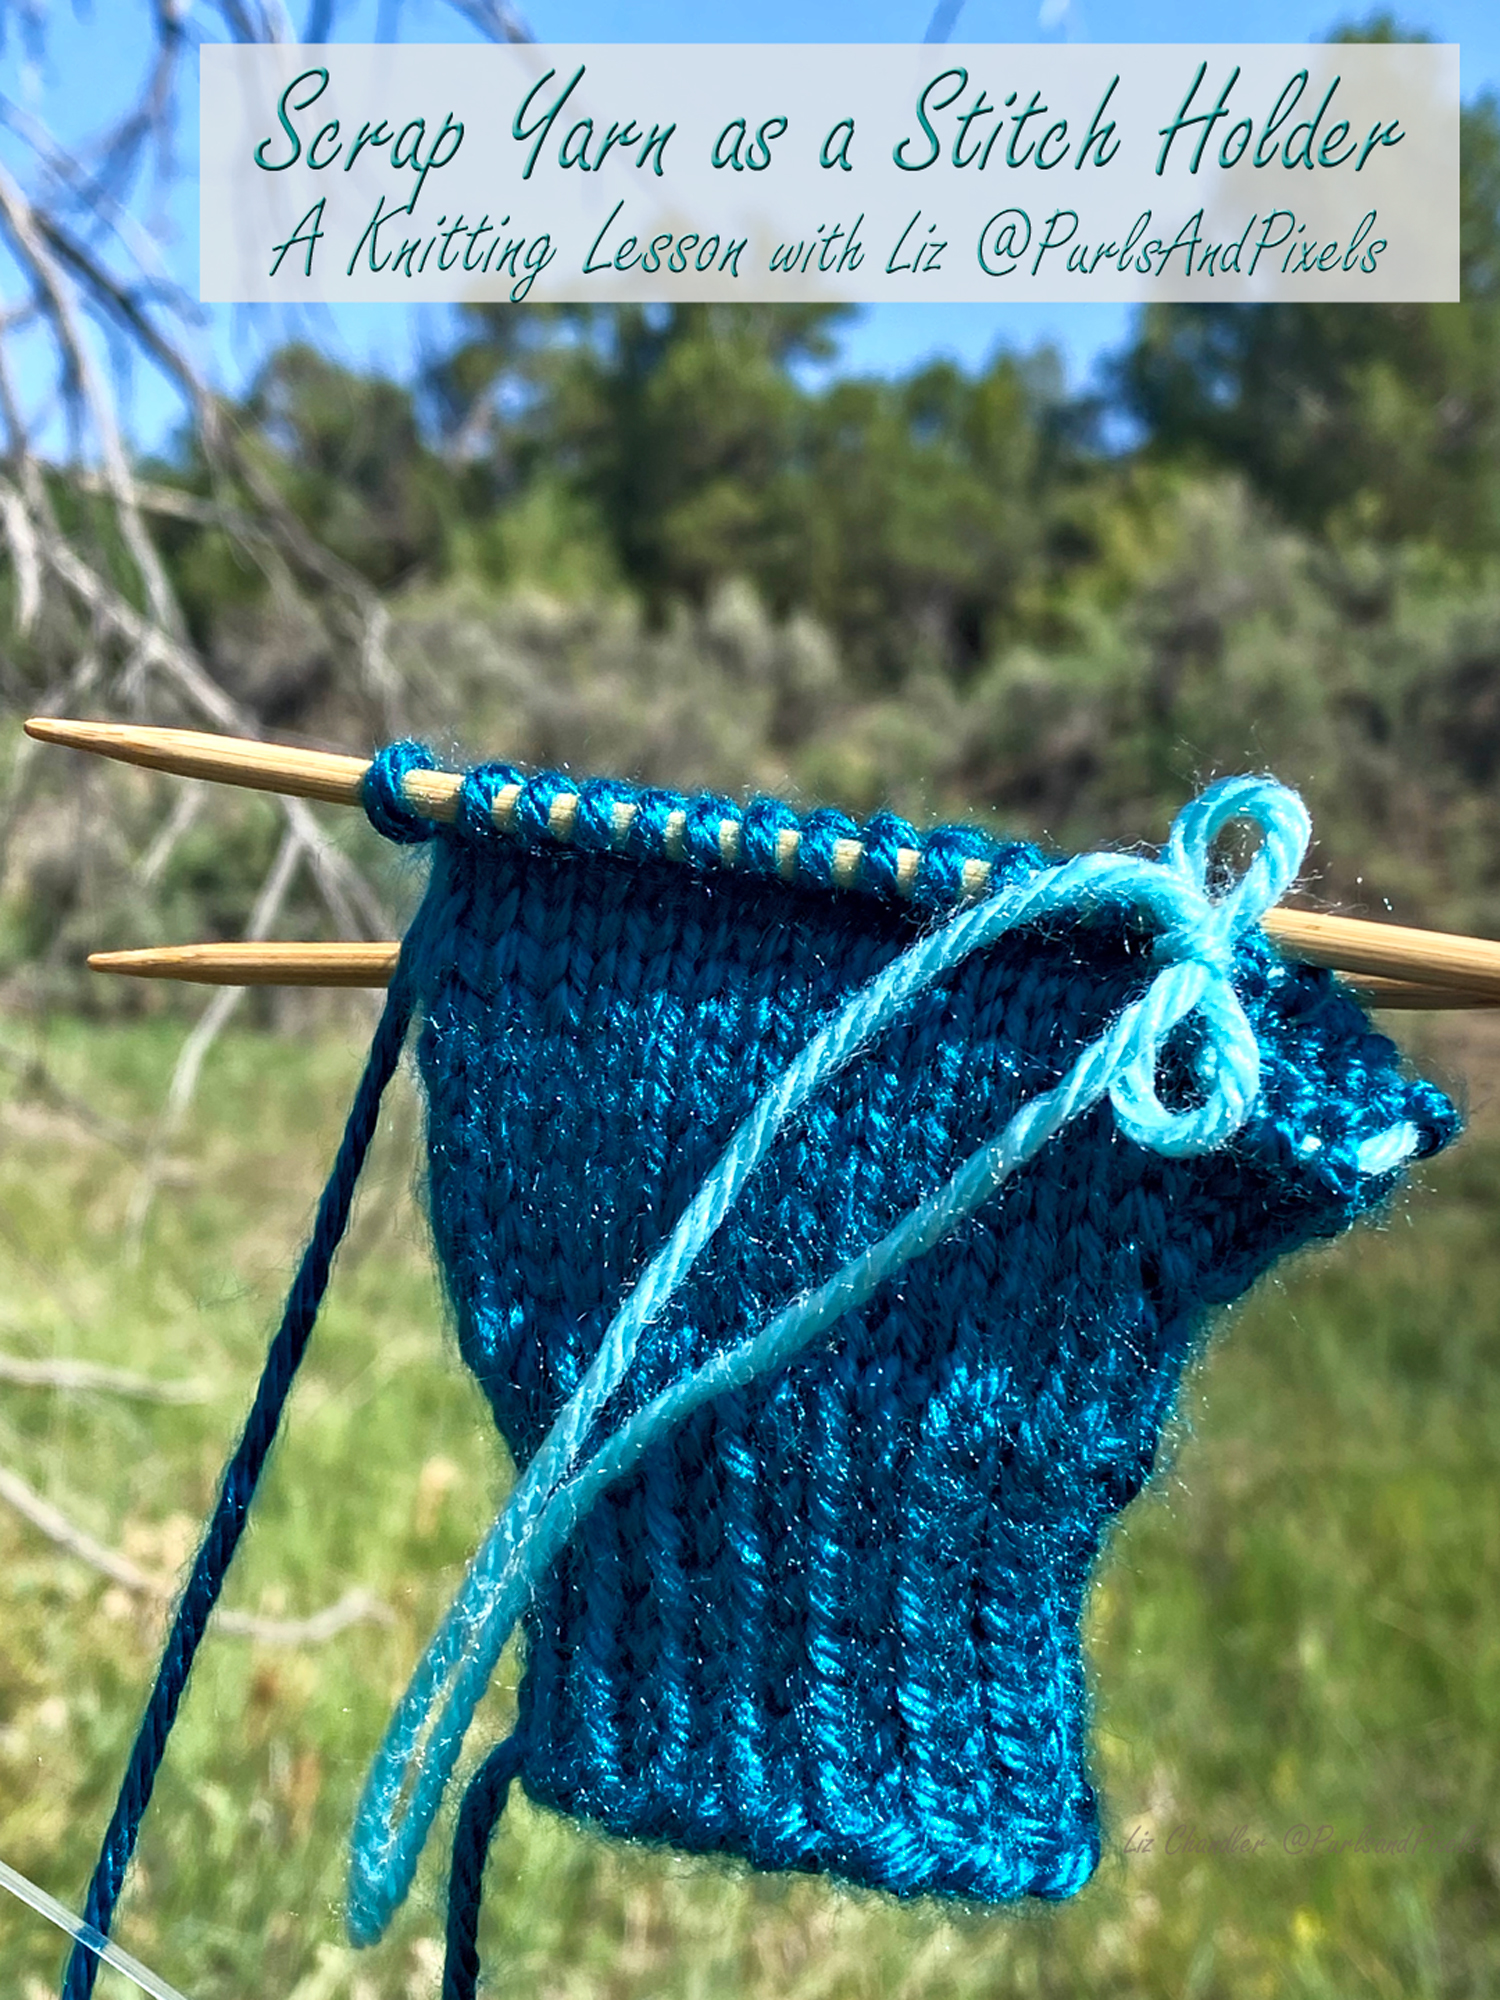 Using Scrap Yarn Instead of Stitch Holders